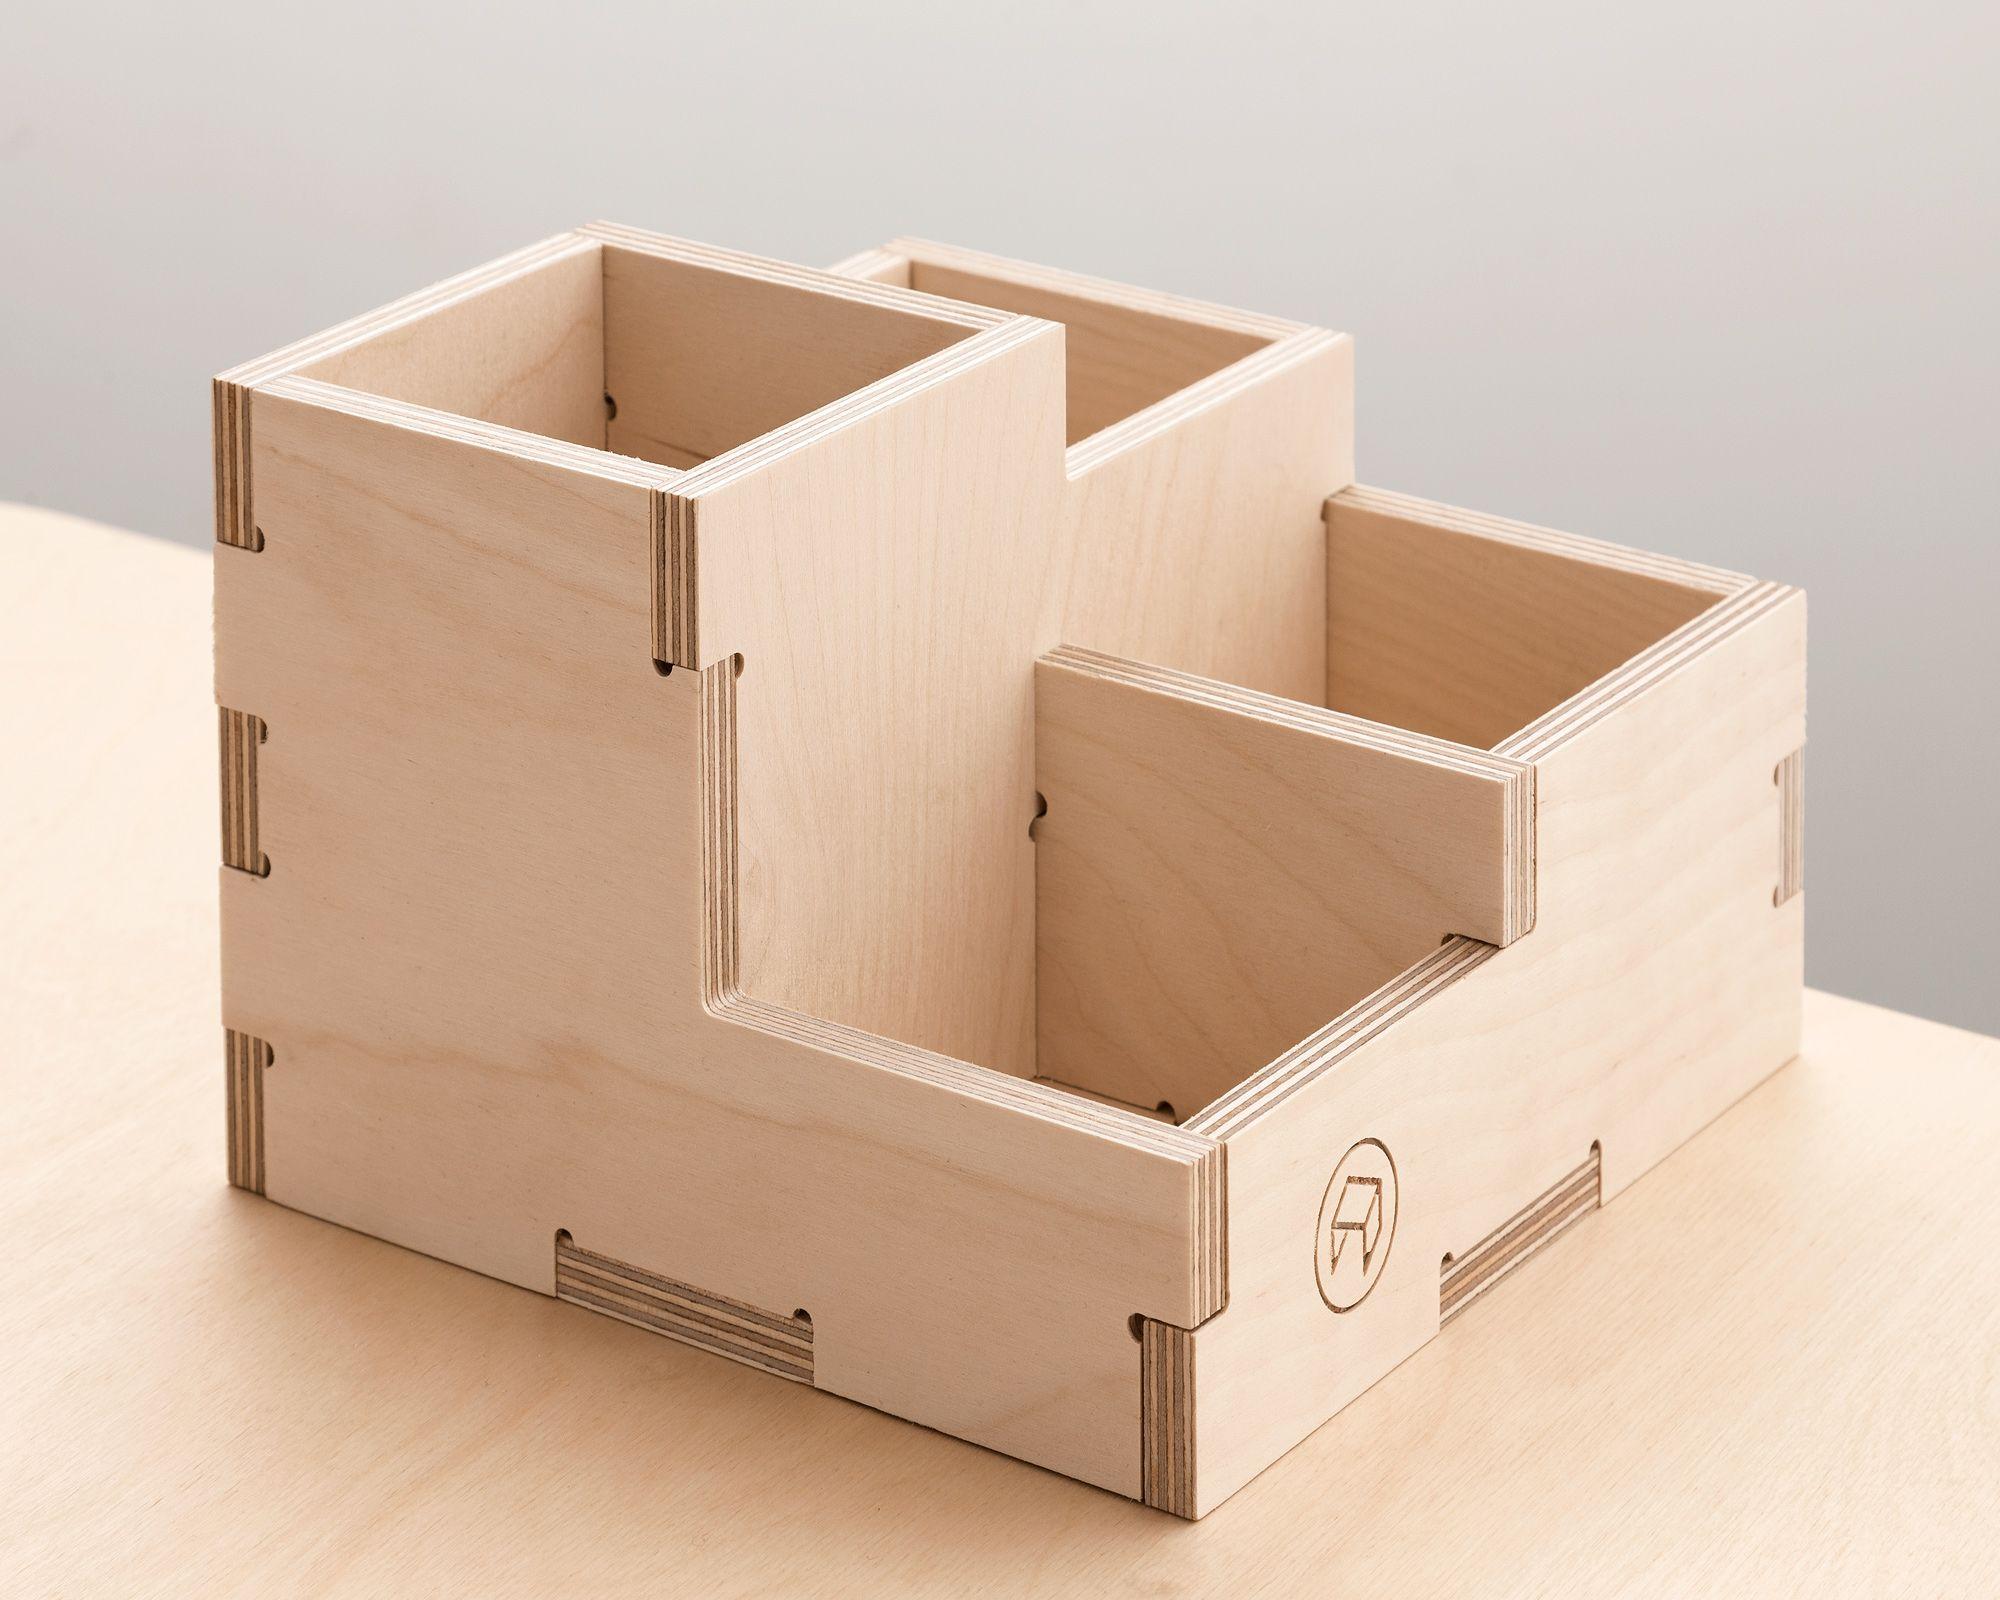 Furniture designed for inspiring workplaces